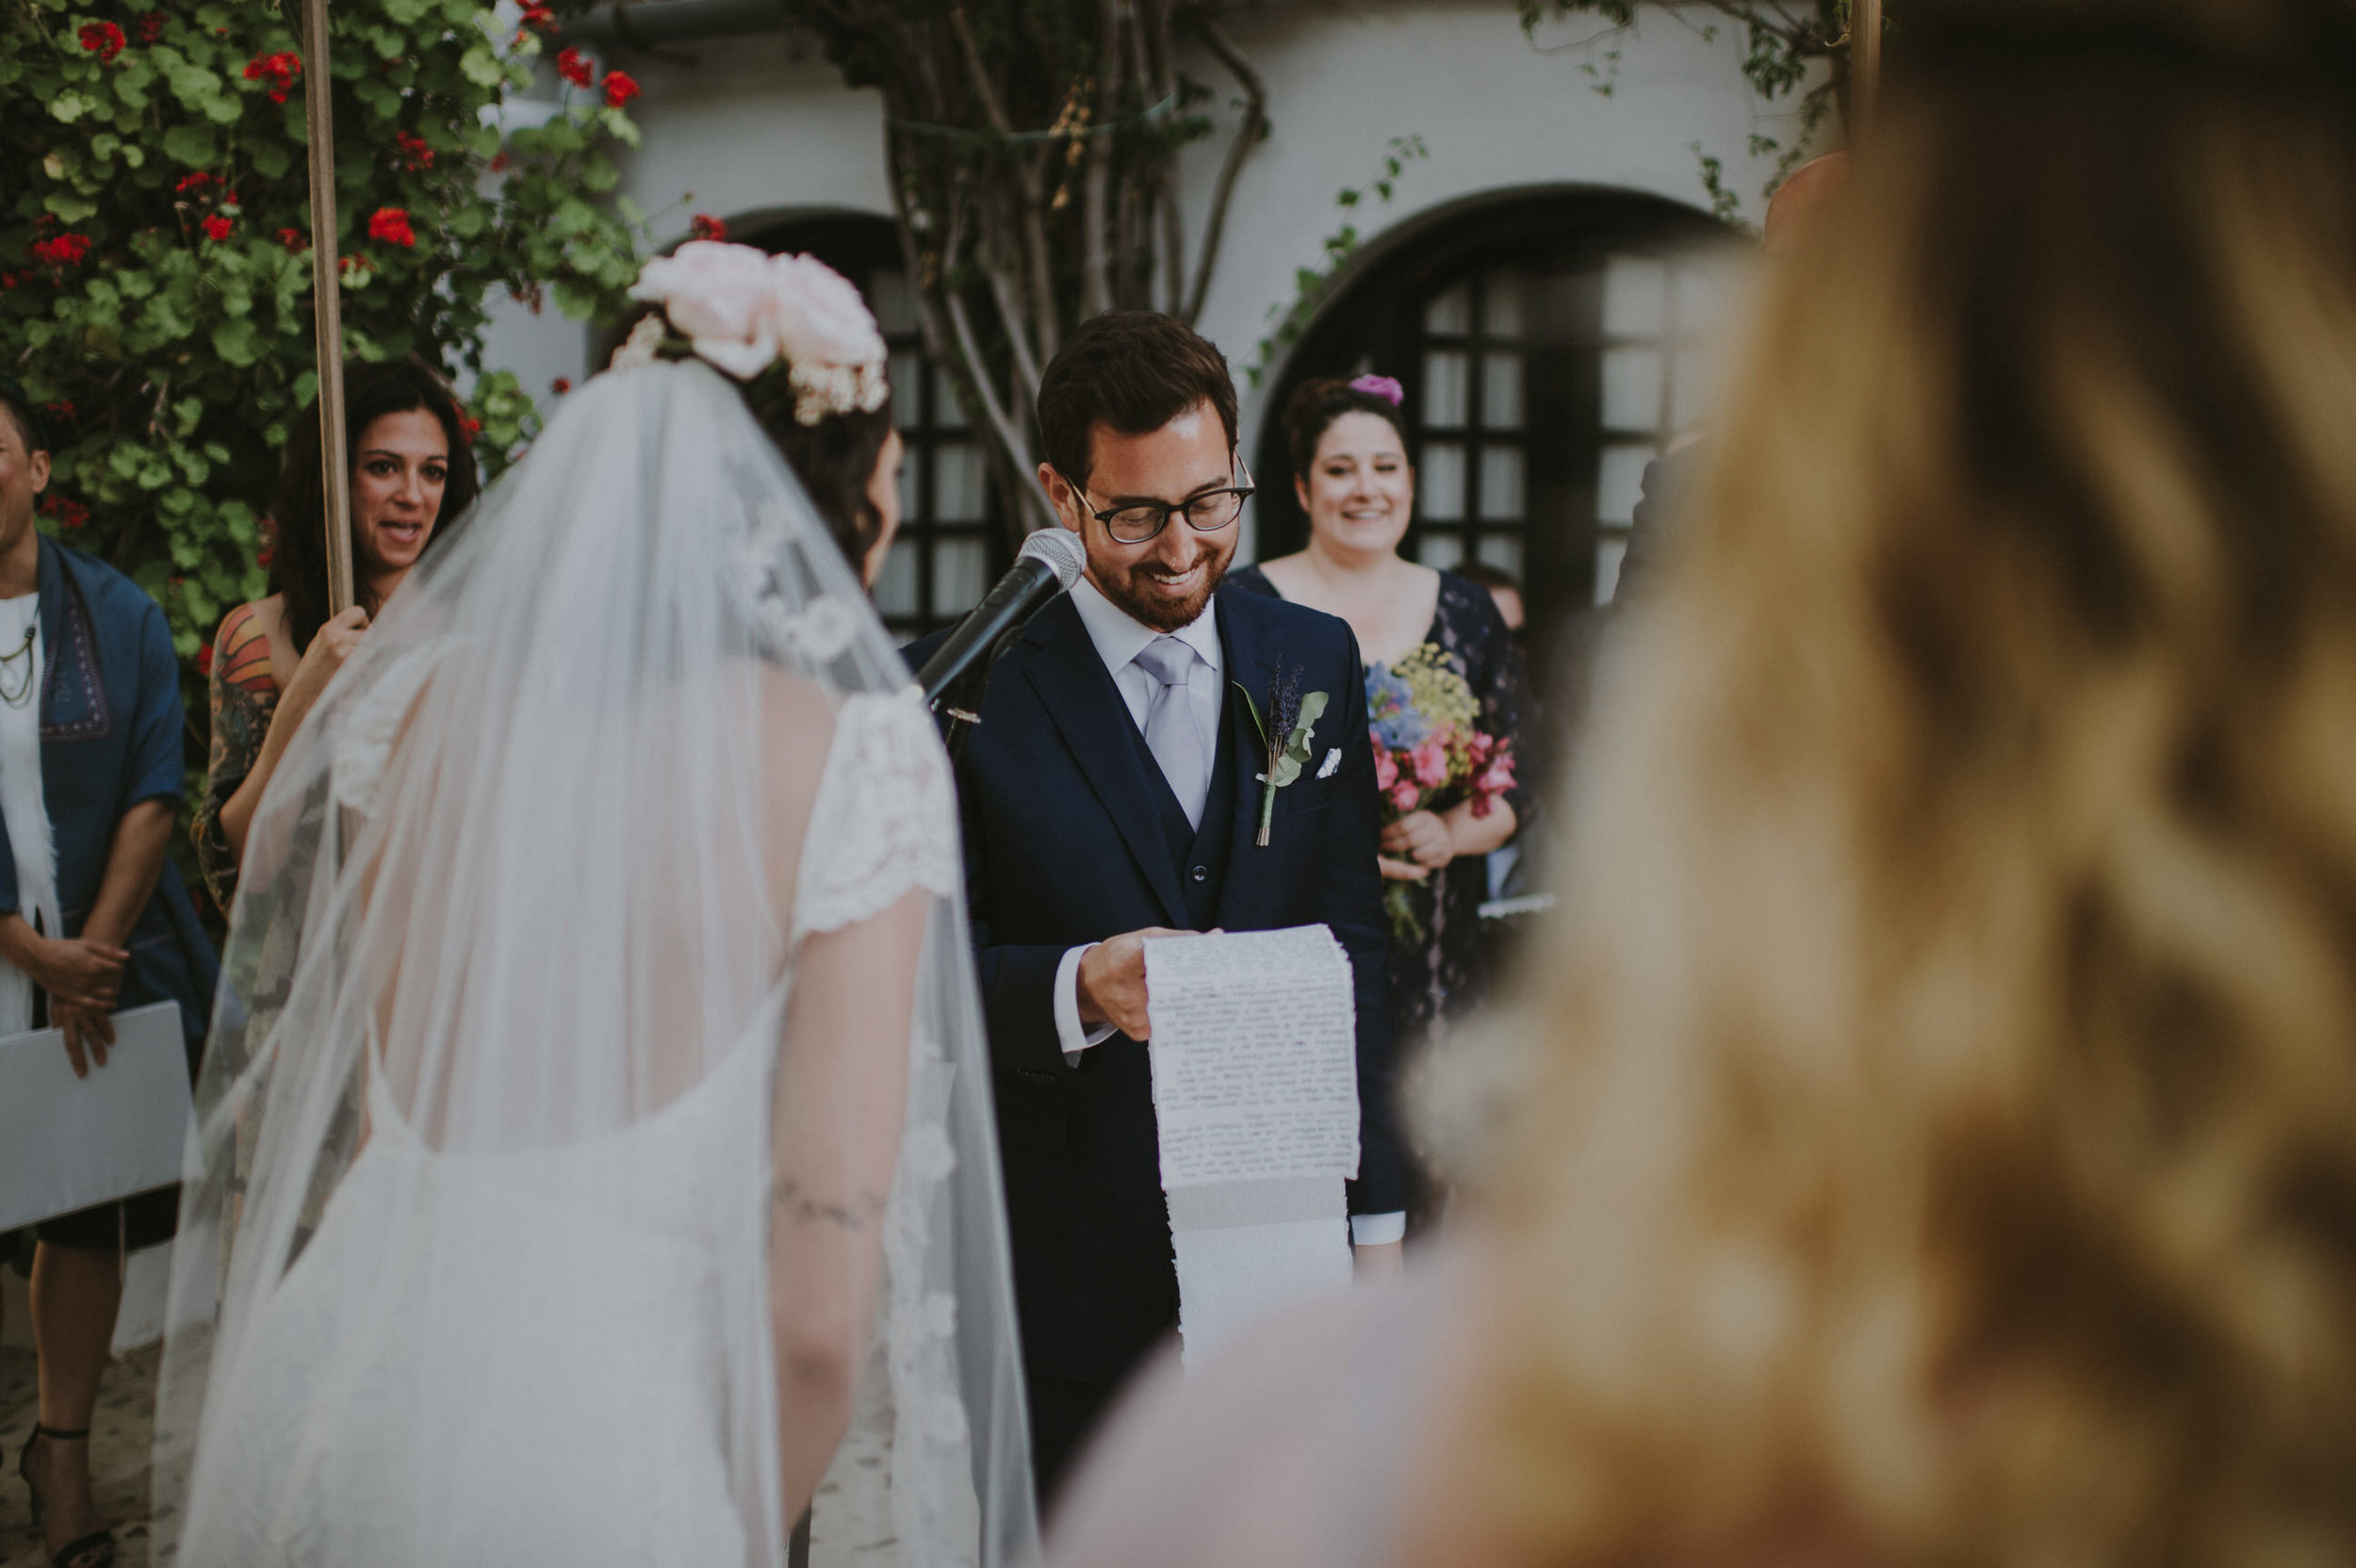 Andres+Amarillo+fotografo+boda+sevilla+natural+sin+poses+hacienda+san+rafael (61).JPG